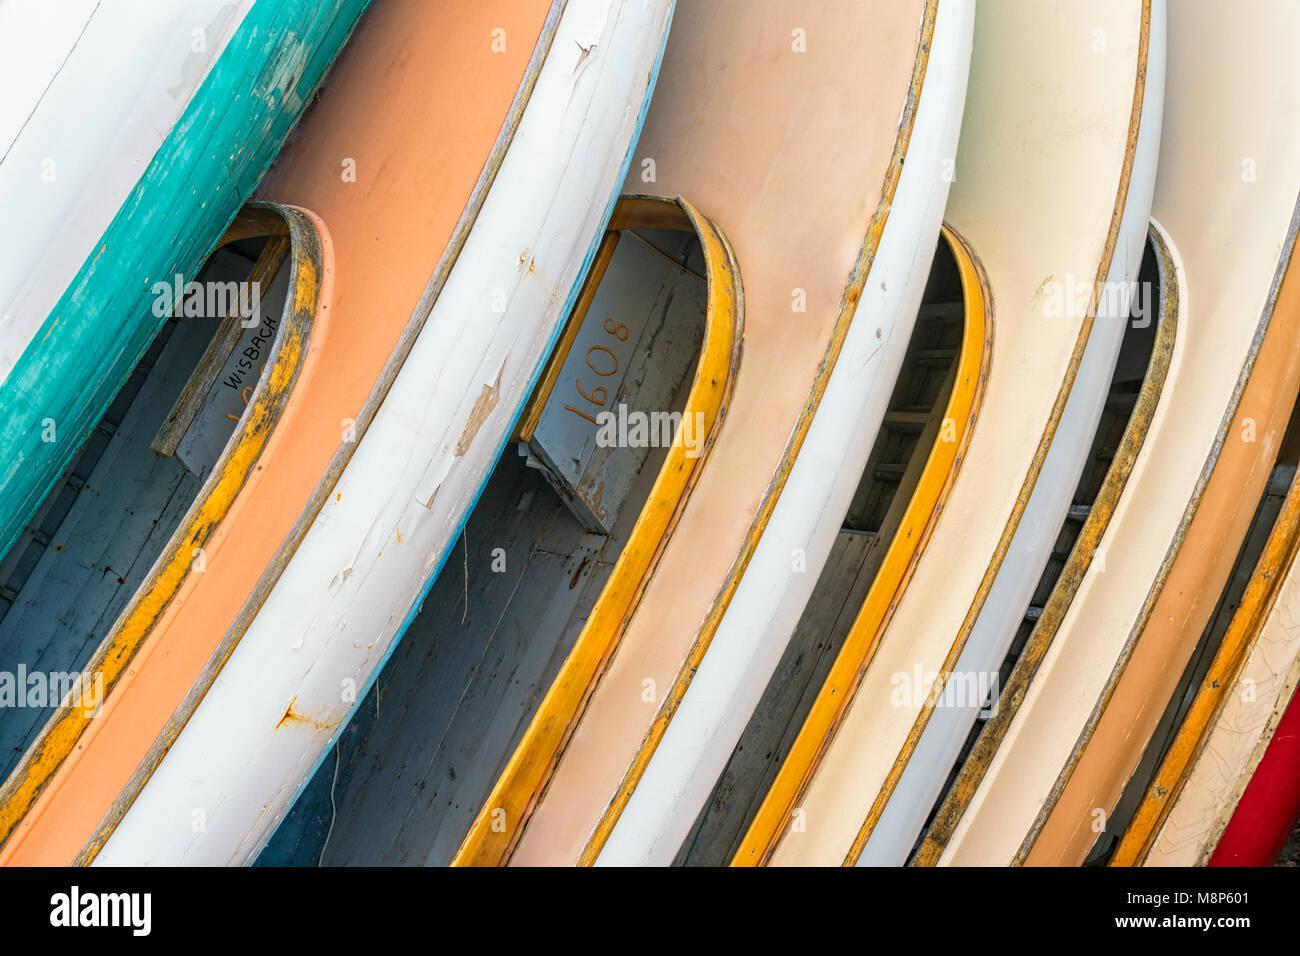 Newport Sailboats waiting for restoration at the International Yacht Restoration School, Newport, Rhode Island - Stock Image